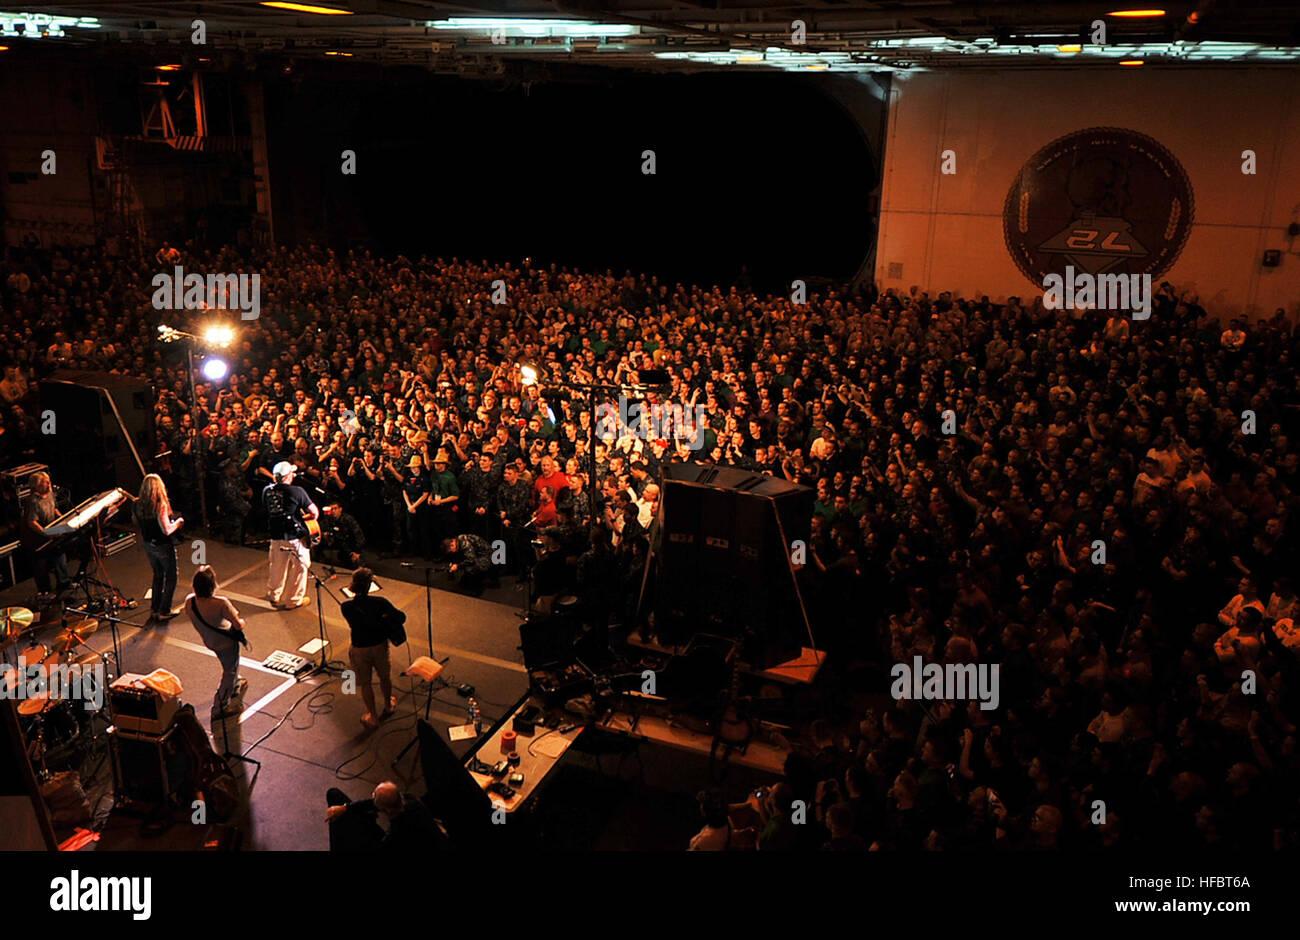 Arabisches Meer (23. April 2012) Country-Musikkünstler führt Toby ...